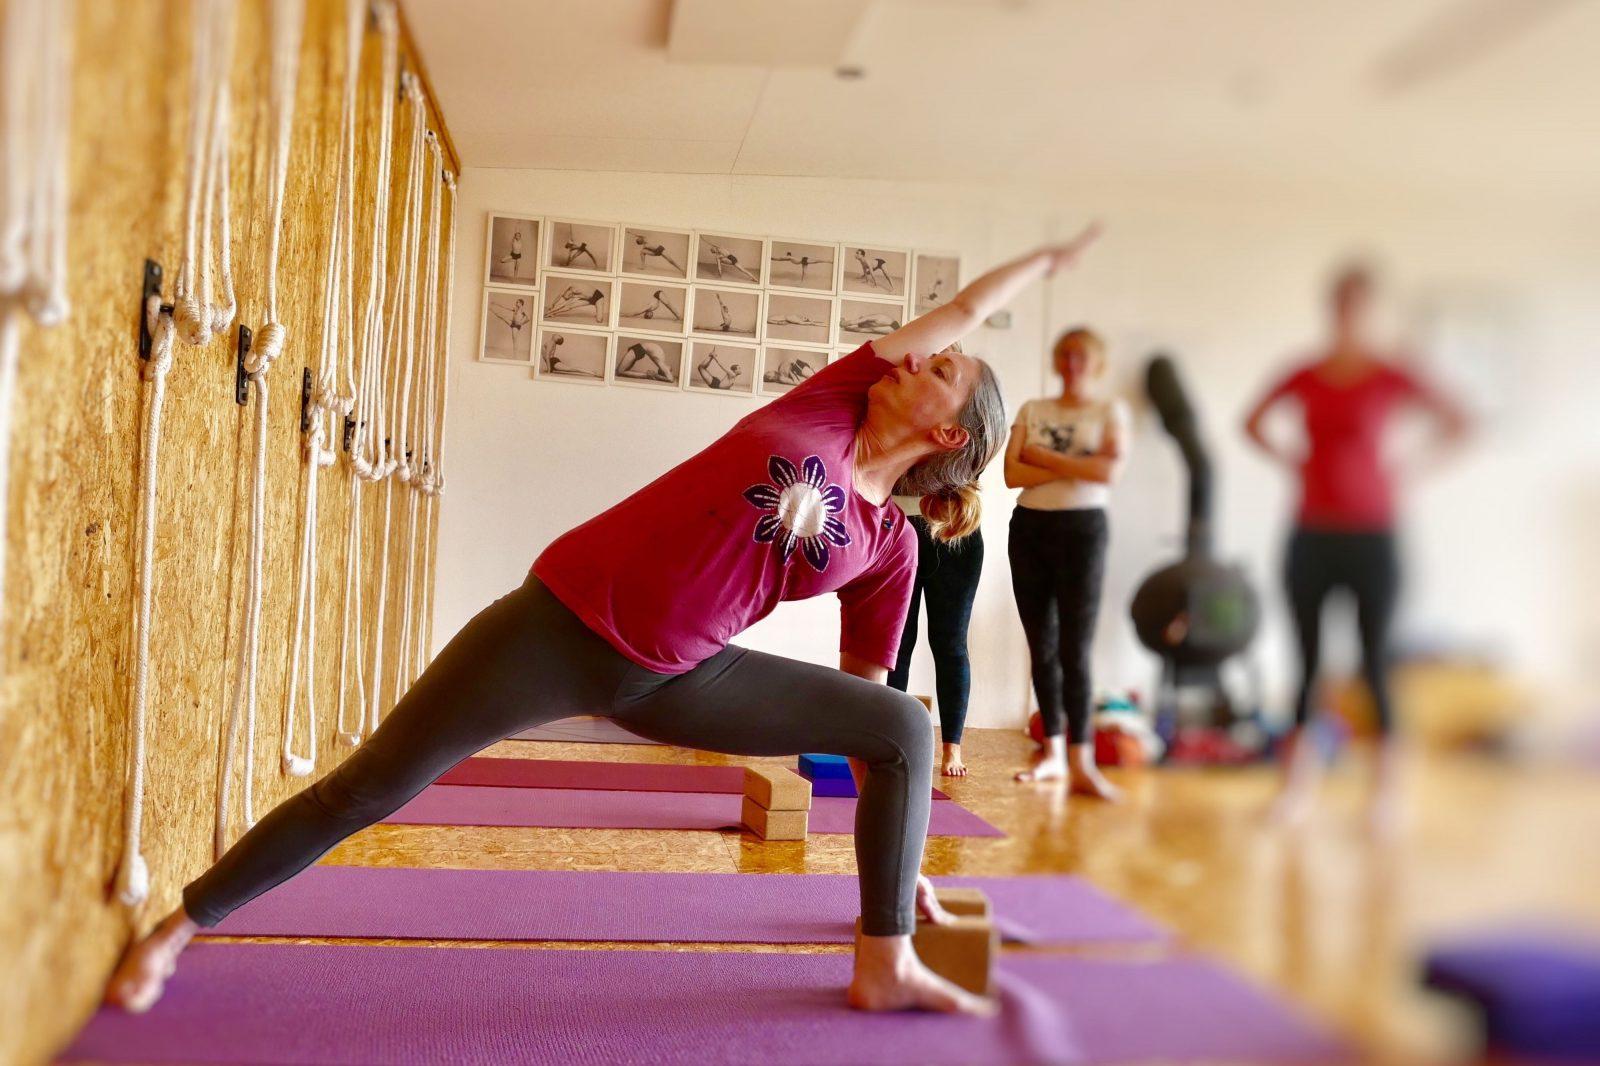 Teresa Yoga Wework Promo 002